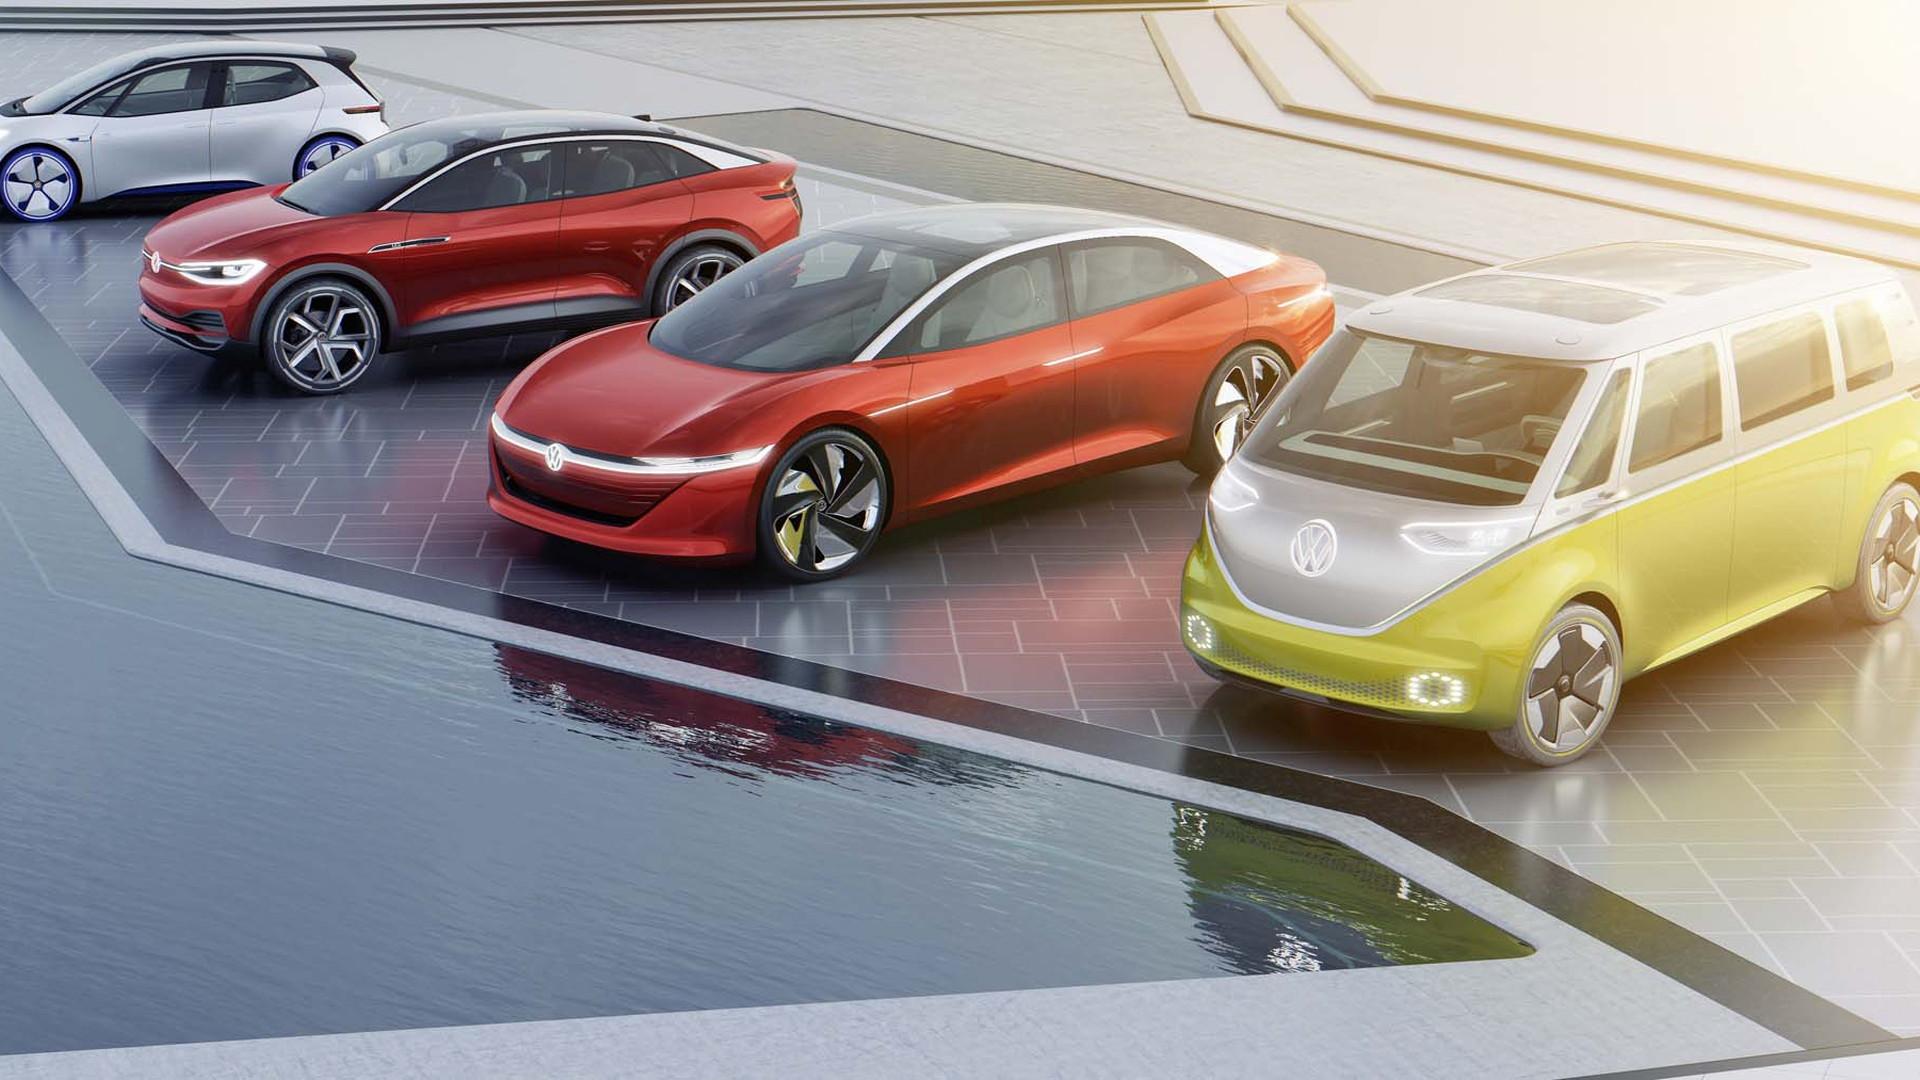 Volkswagen News Green Car Photos News Reviews And Insights